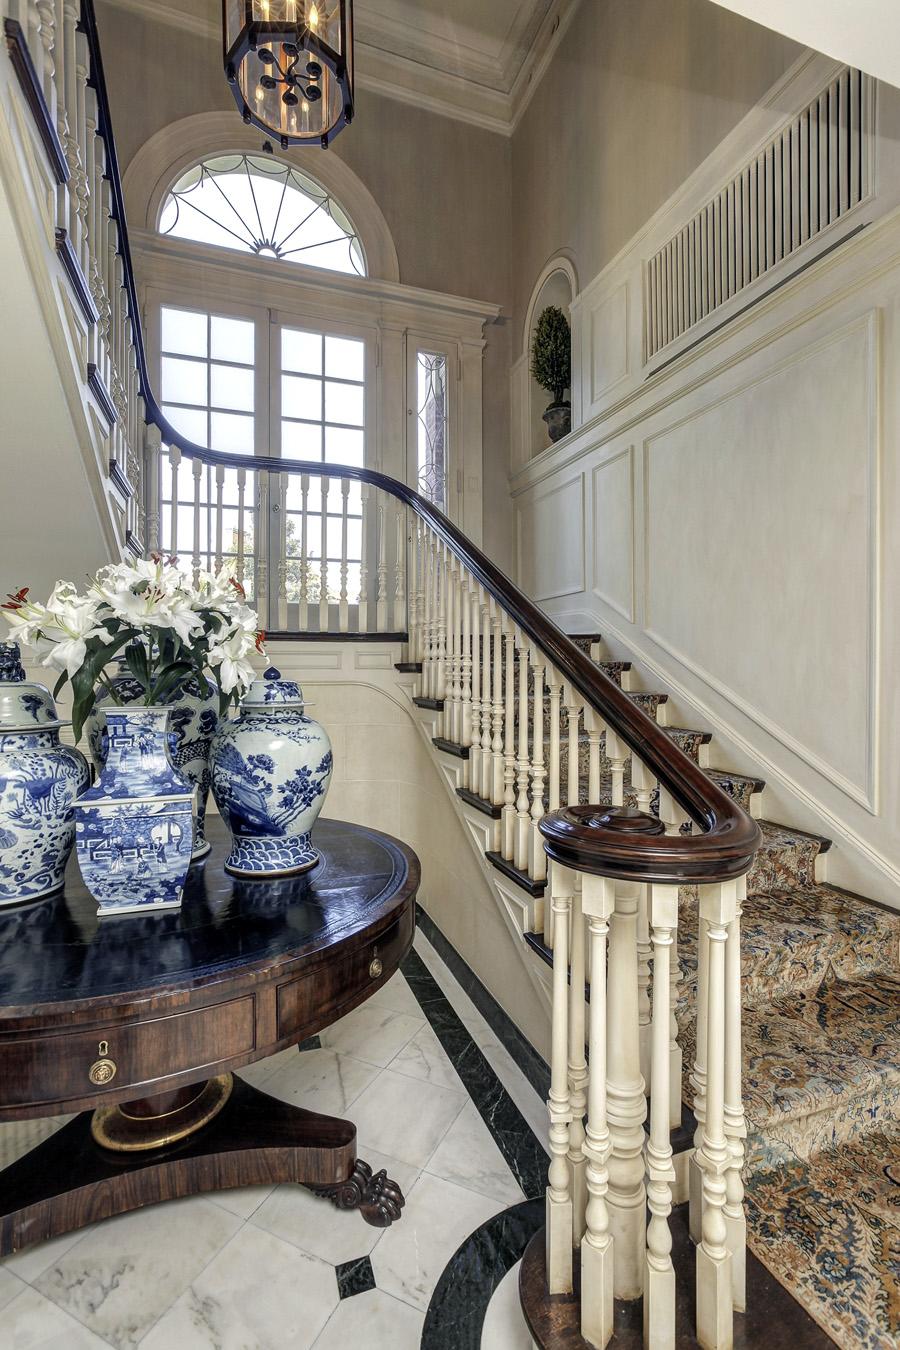 English Country Family Room: $13.7 Million Historic Georgian Mansion In Washington, DC